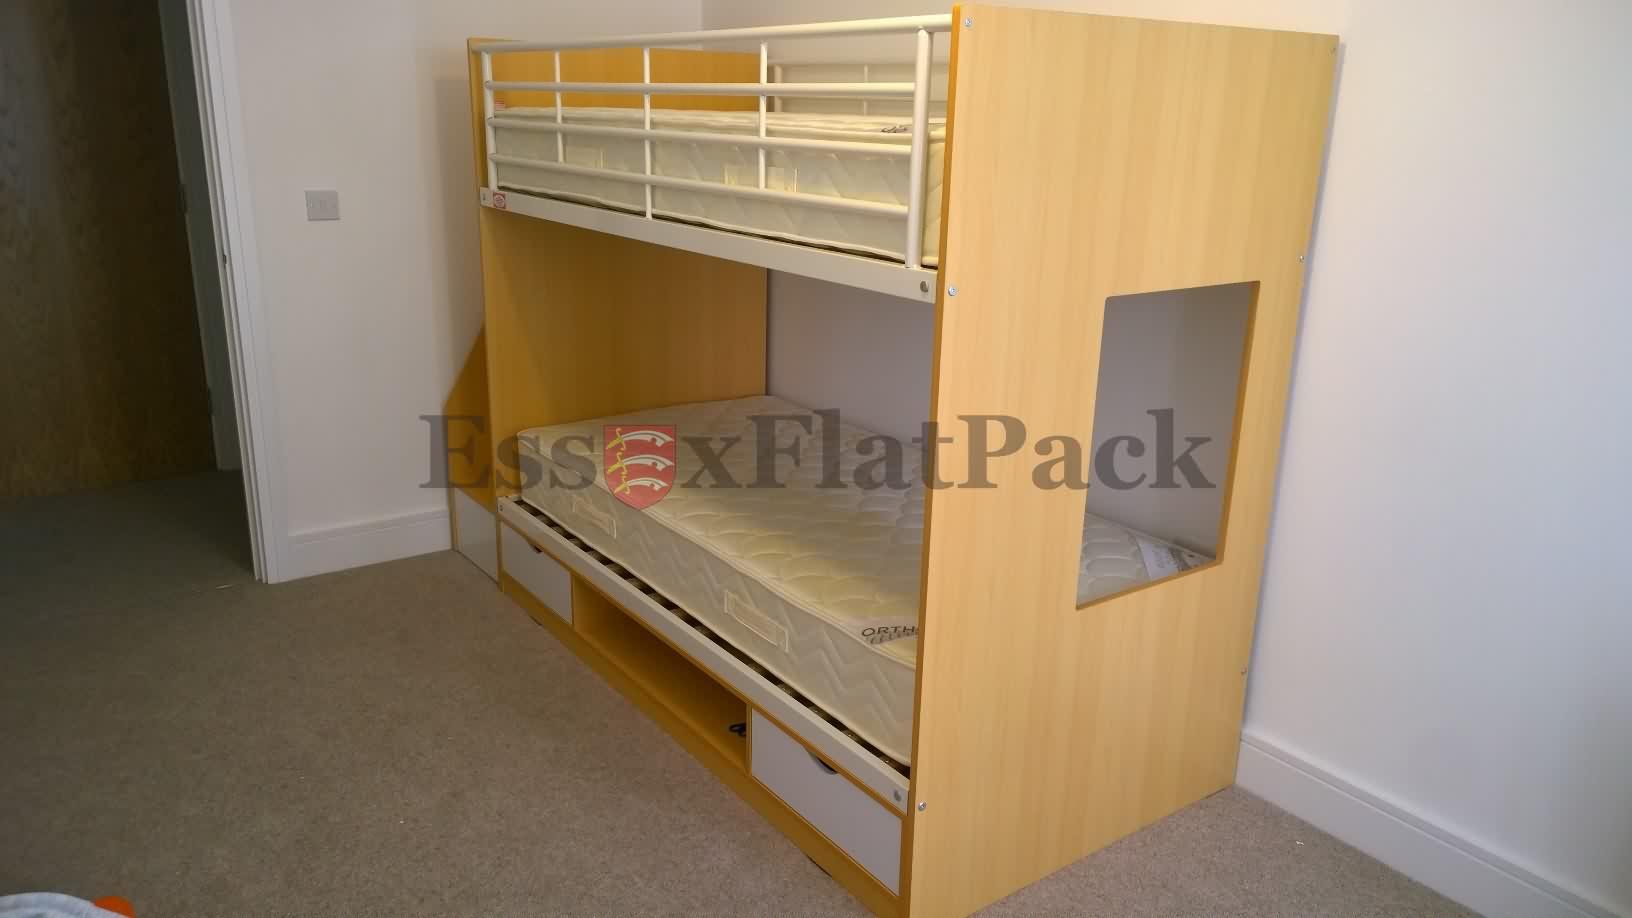 essexflatpack-cabin-bunks-20150820155346.jpg